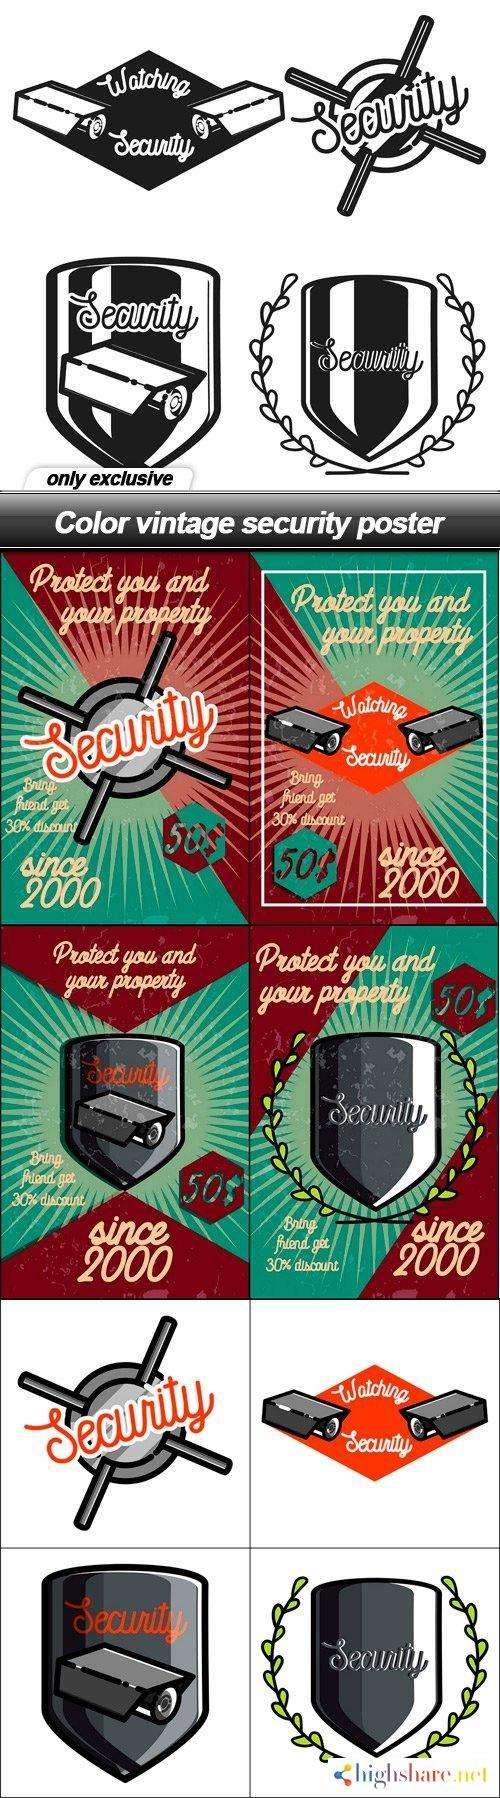 color vintage security poster 9 eps 5f421114bf4b2 - Color vintage security poster - 9 EPS